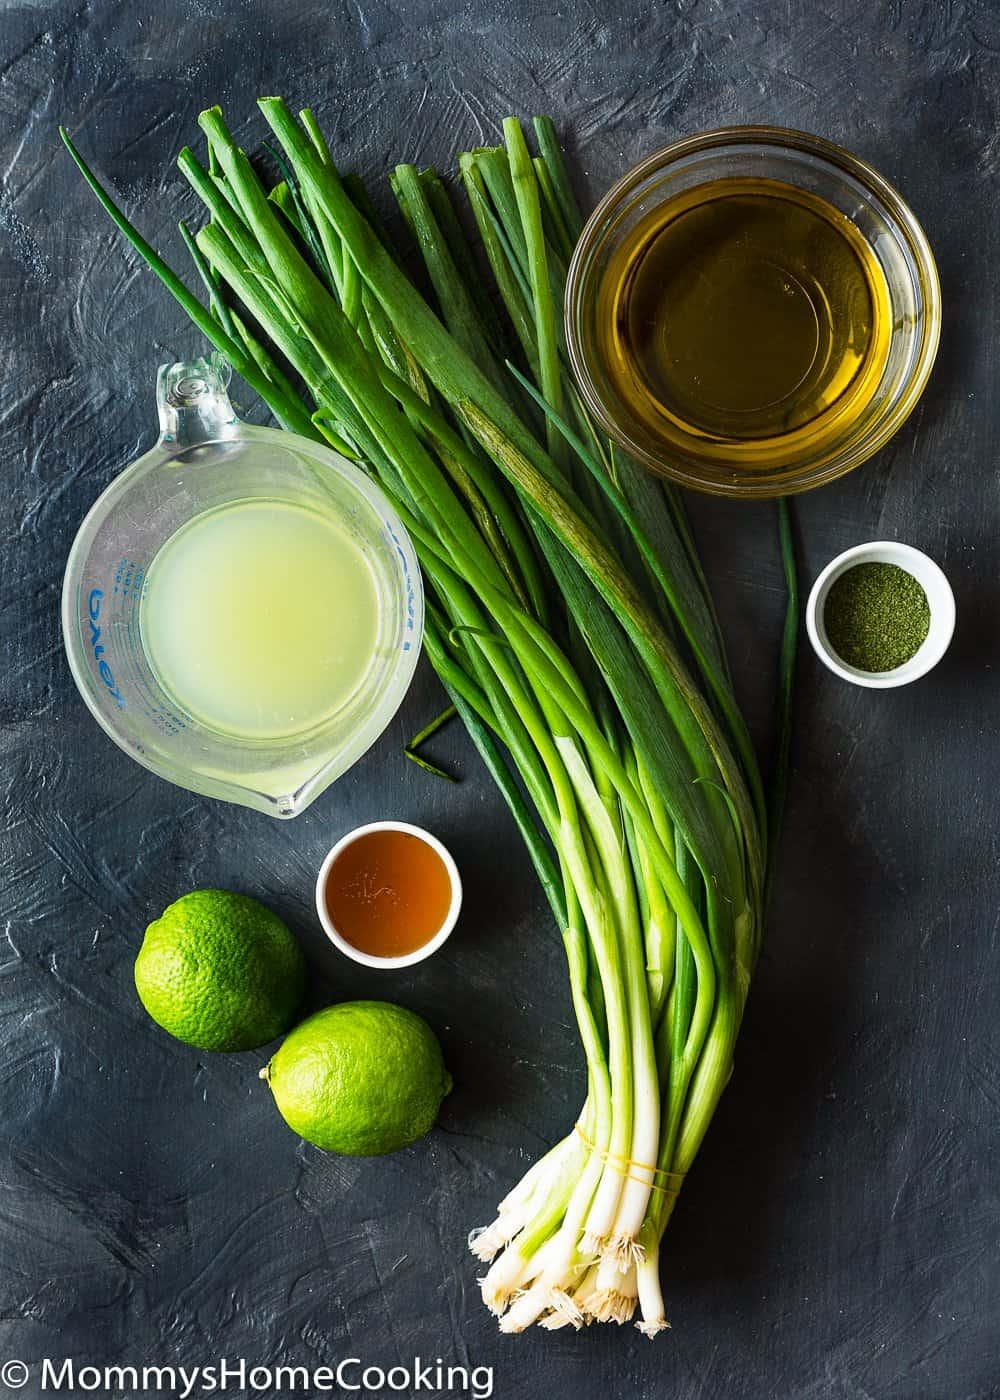 Green Onion Vinaigrette Ingredients